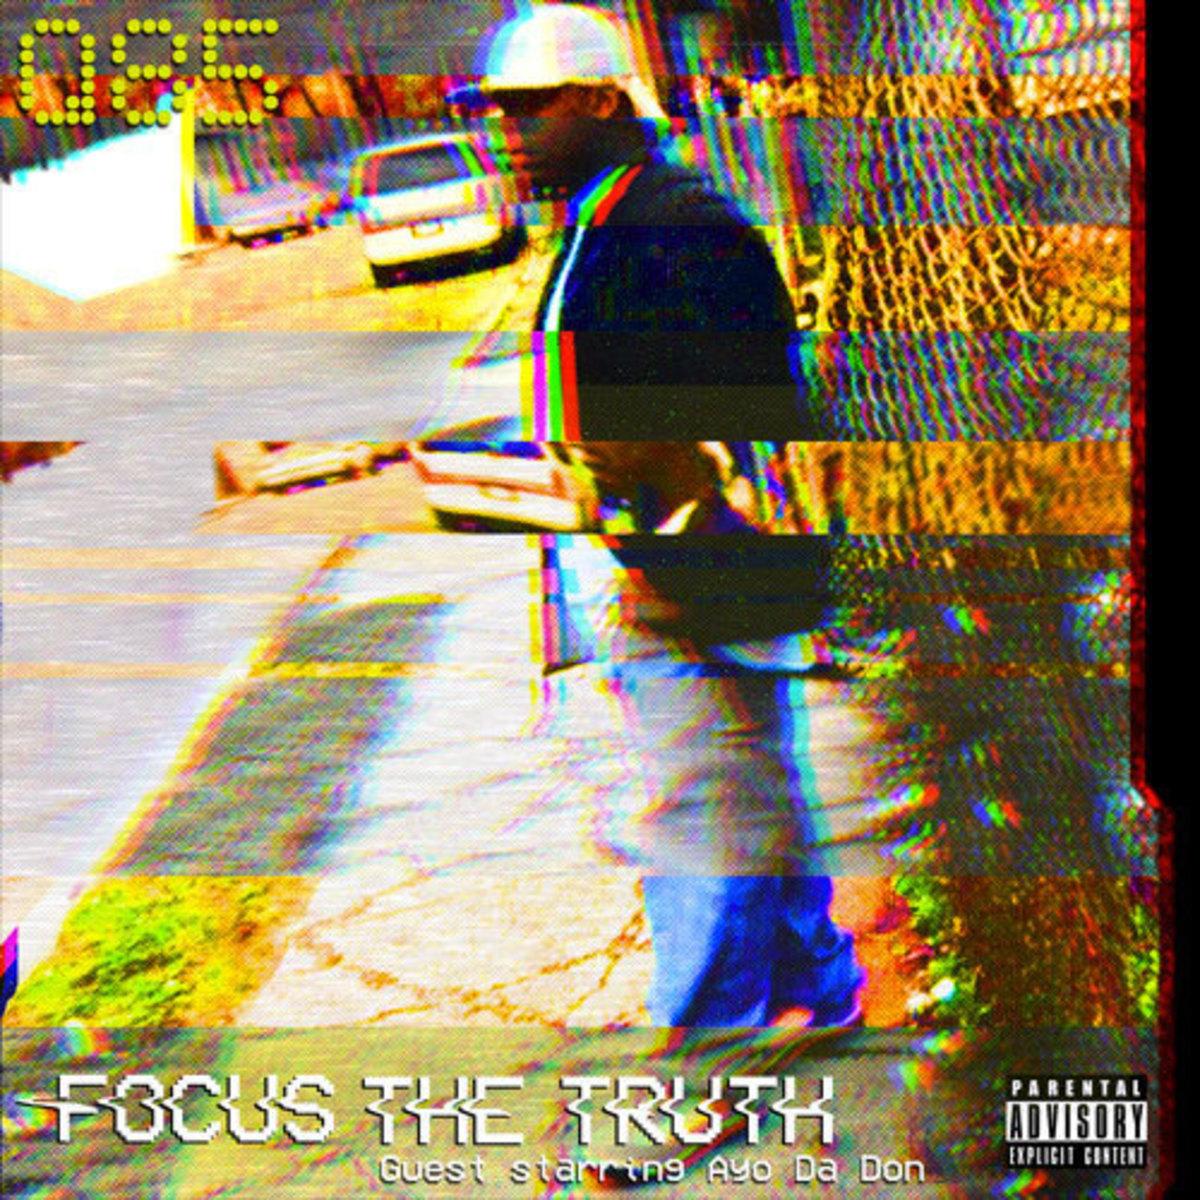 focus-the-truth-gonna-change.jpg